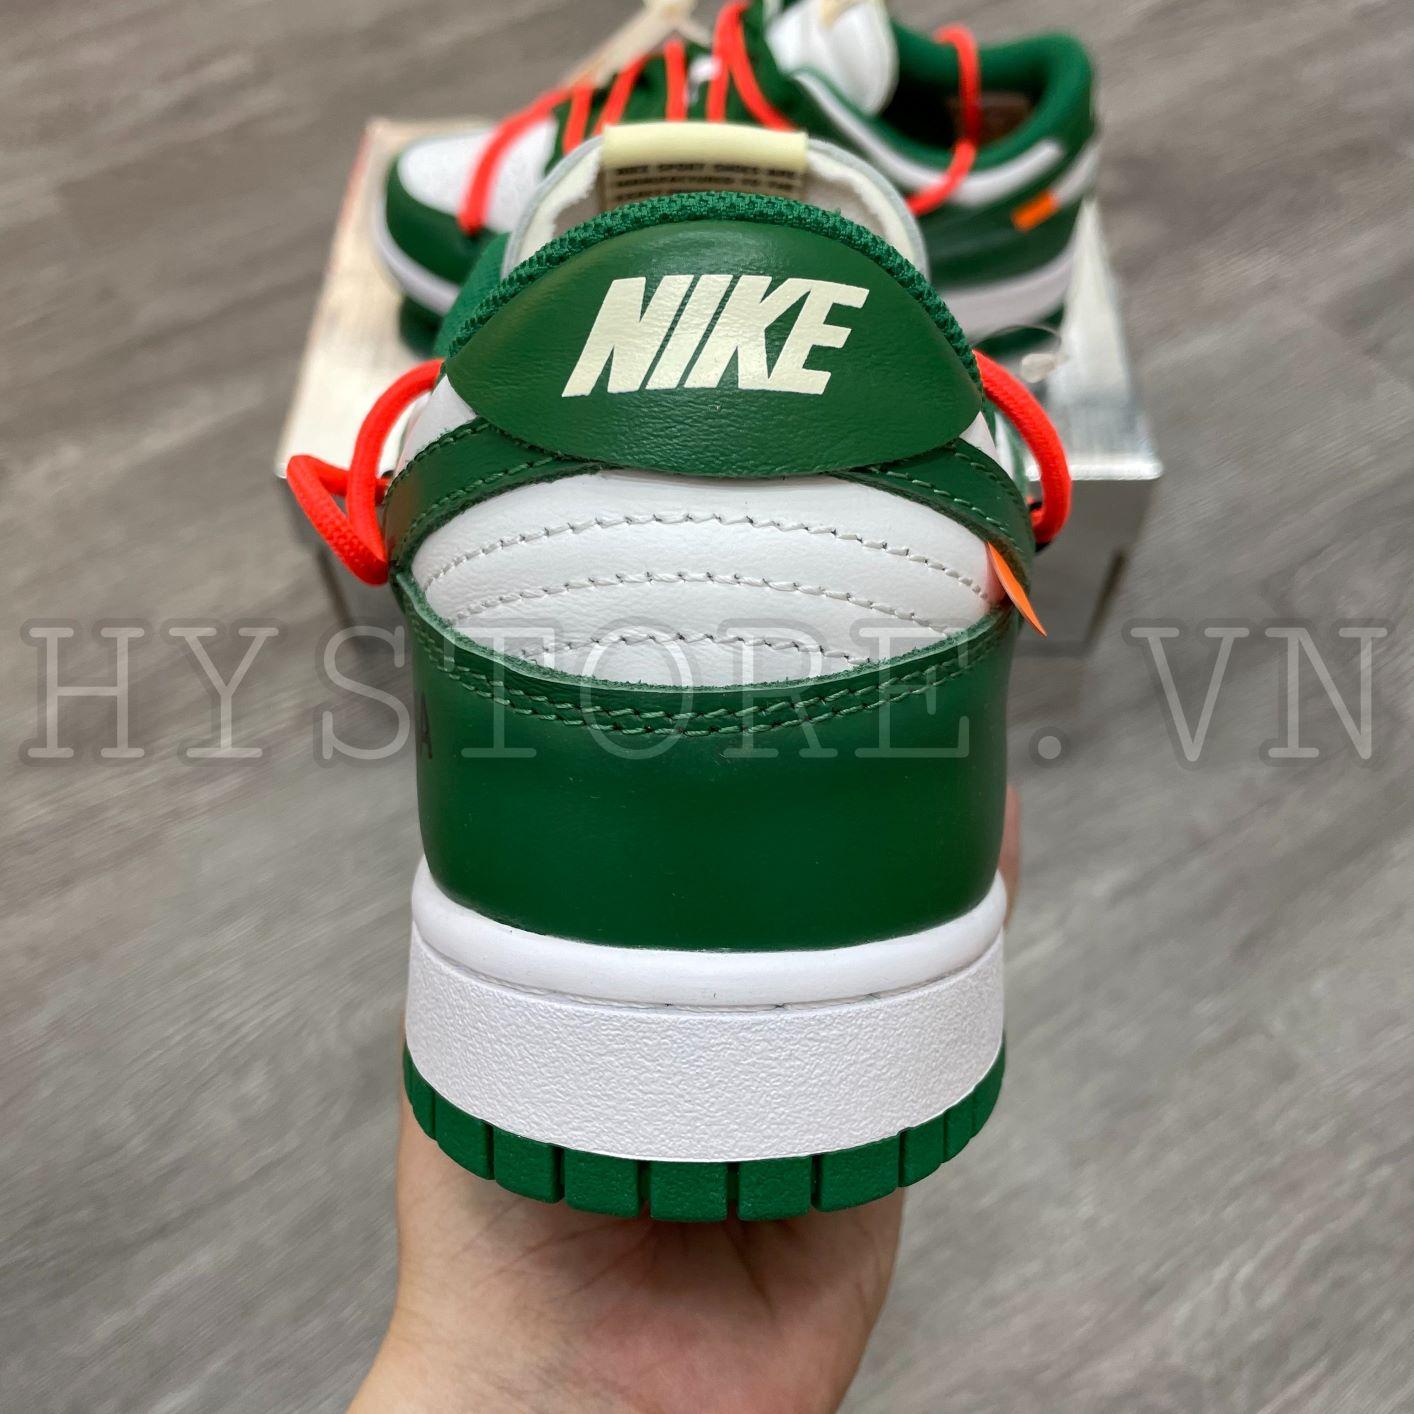 Giày Nike Dunk Offwhite Pine Green